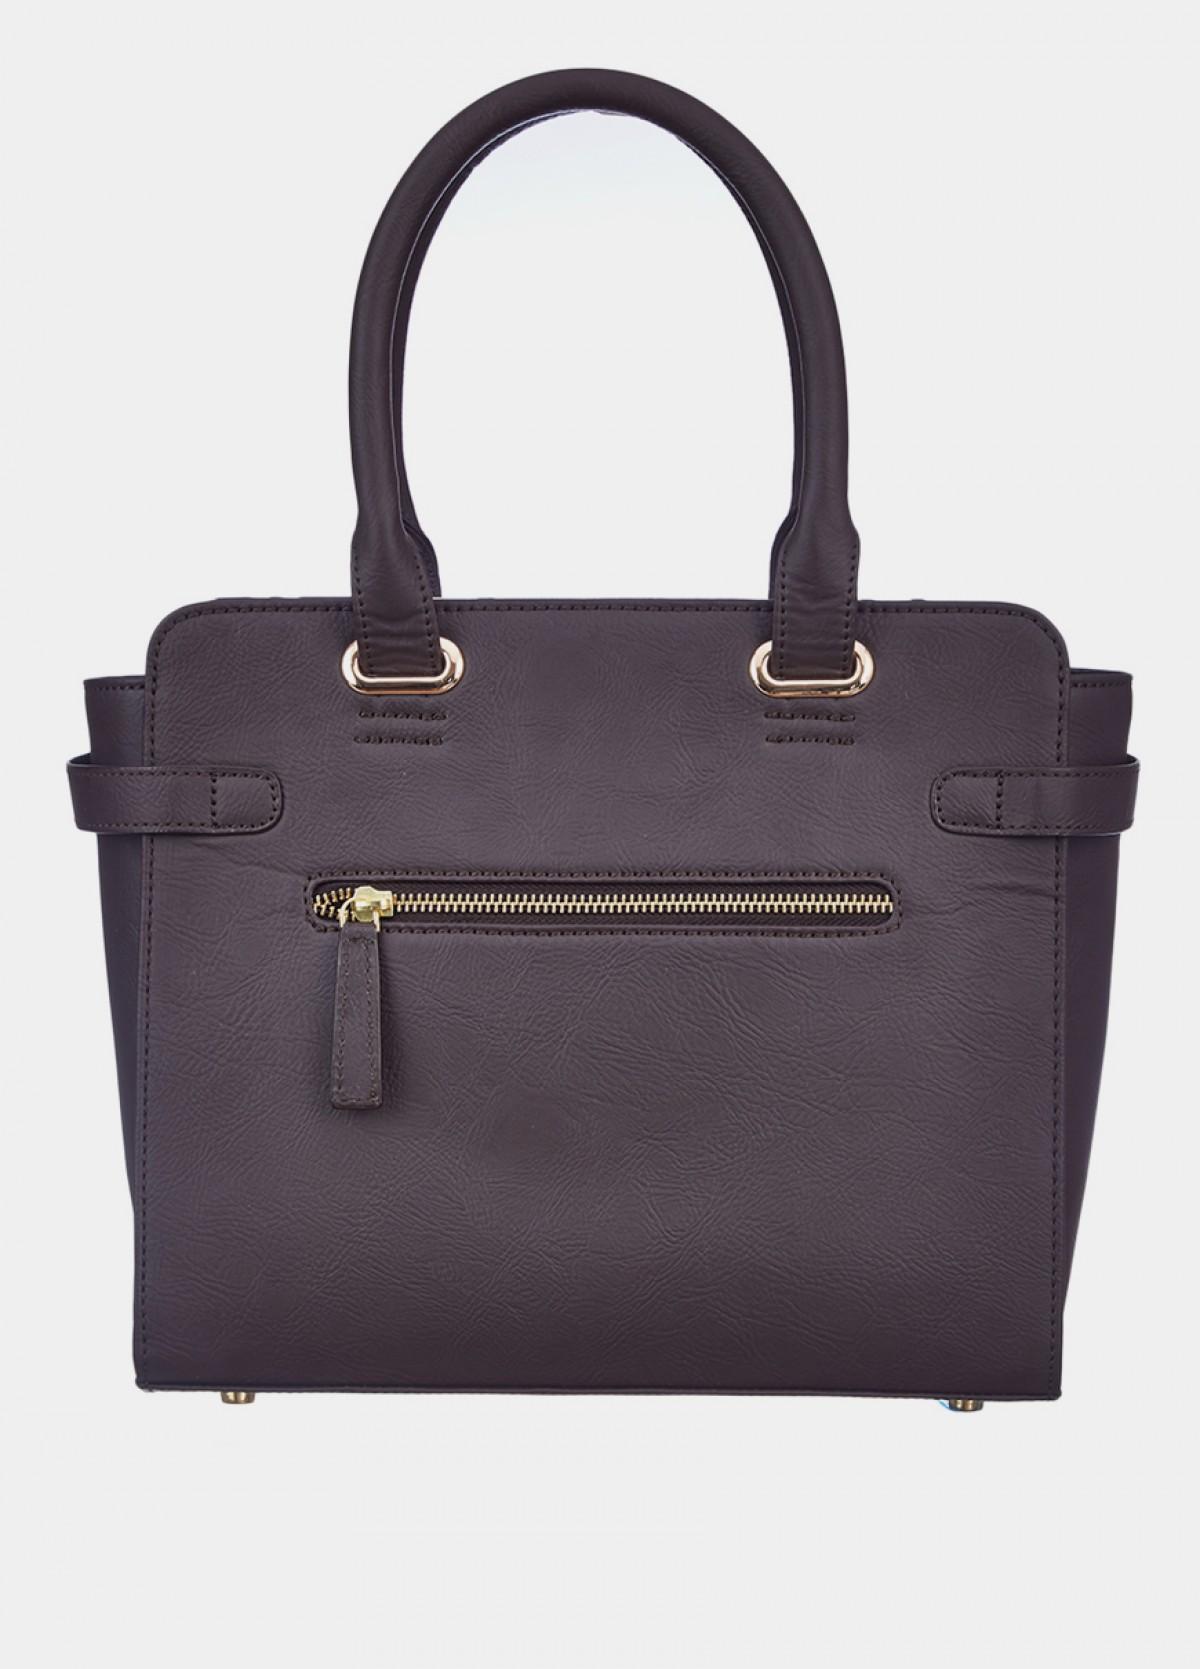 The Bindu Shoulder Bag